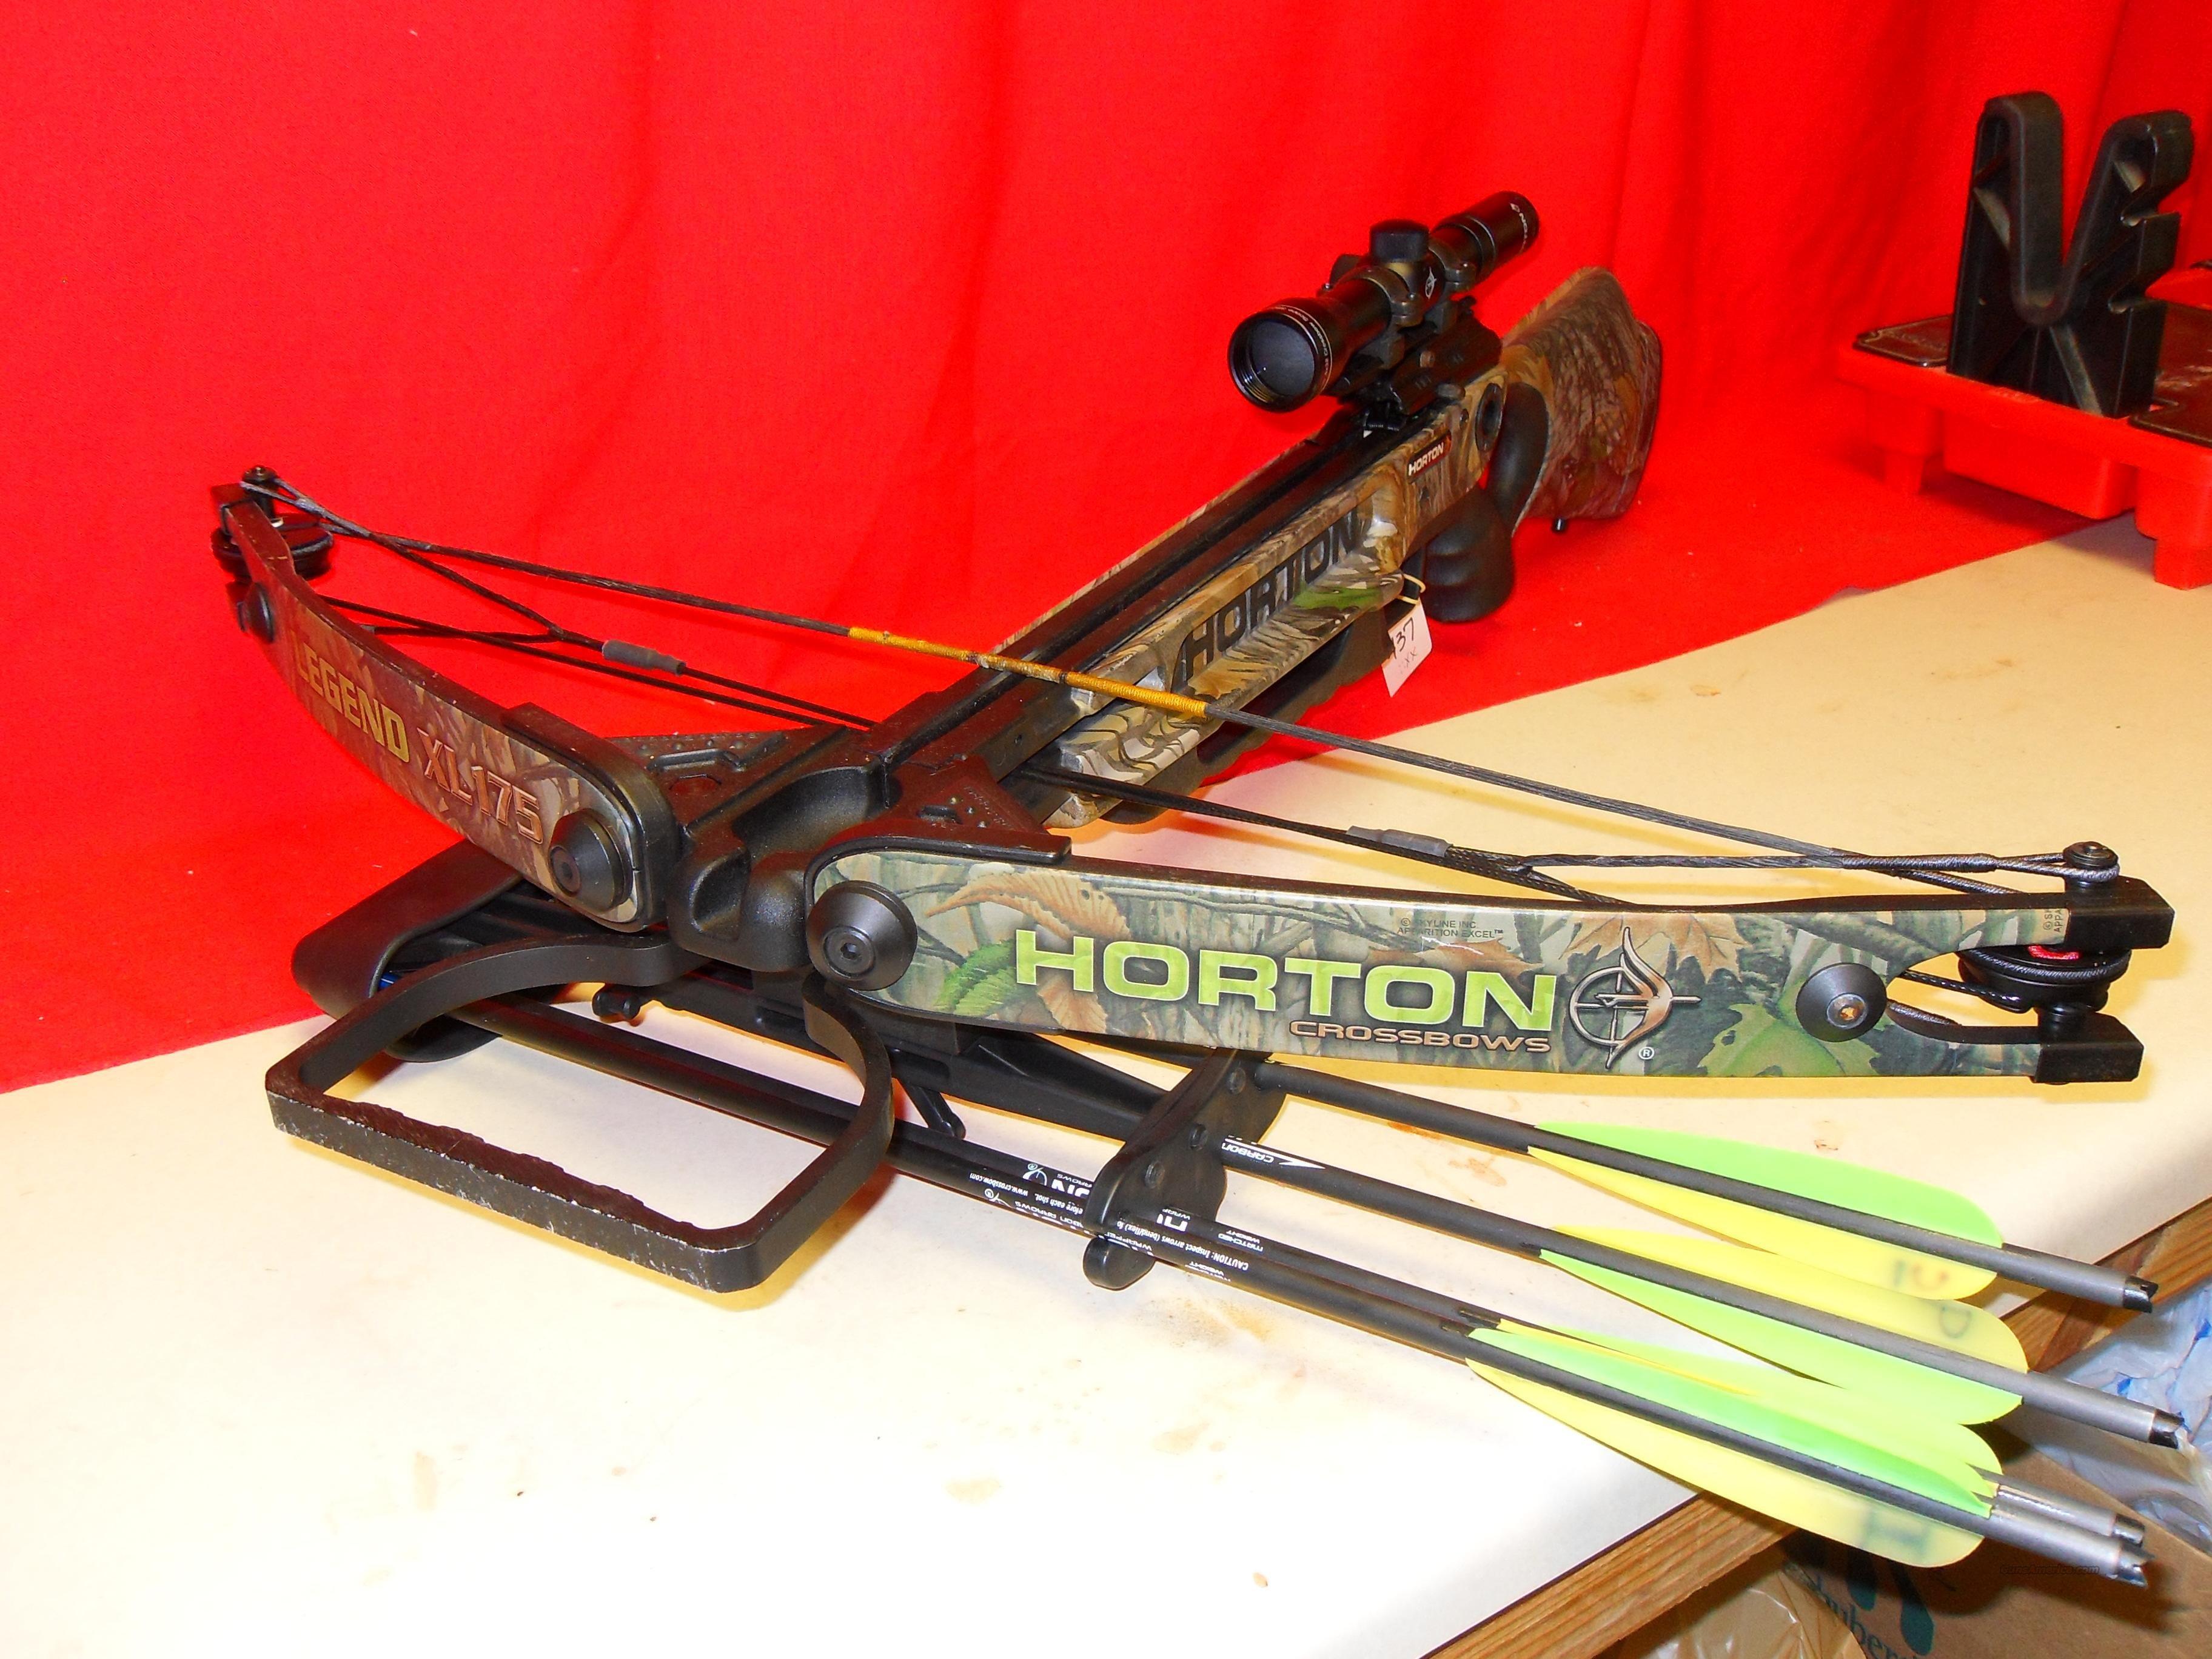 Horton Legend XL175